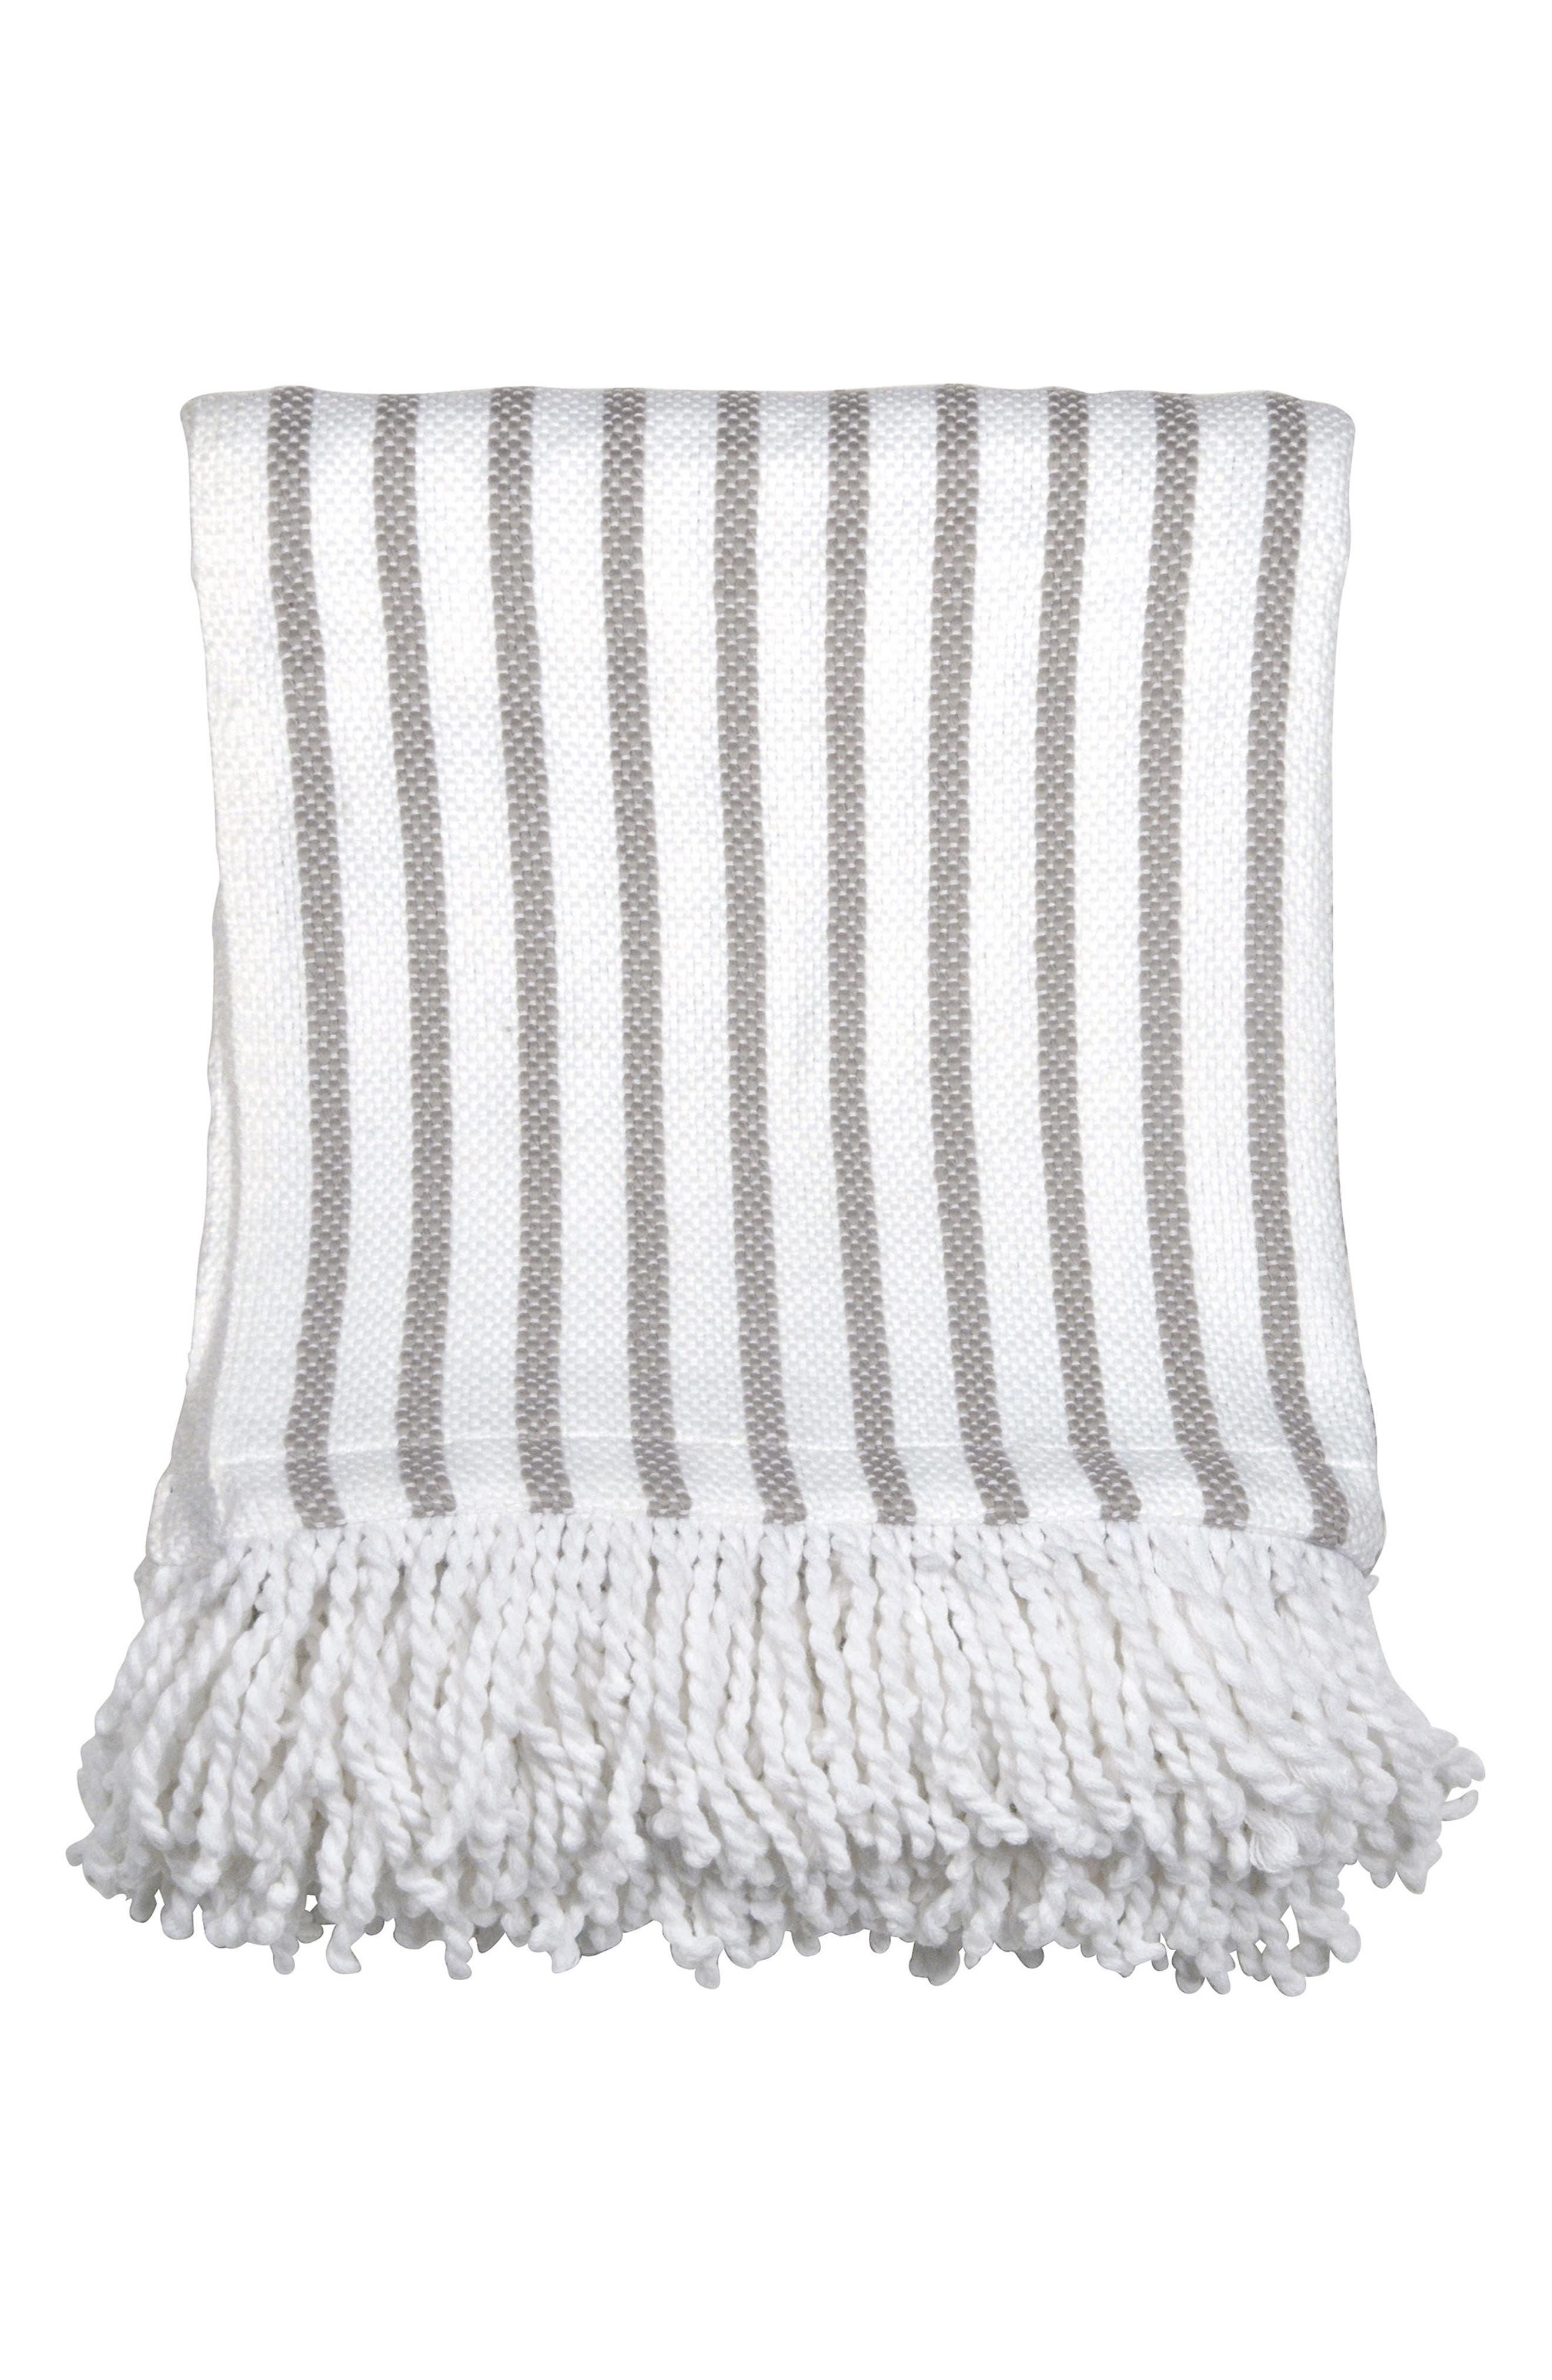 Fringe Throw Blanket,                         Main,                         color, GREY/ WHITE